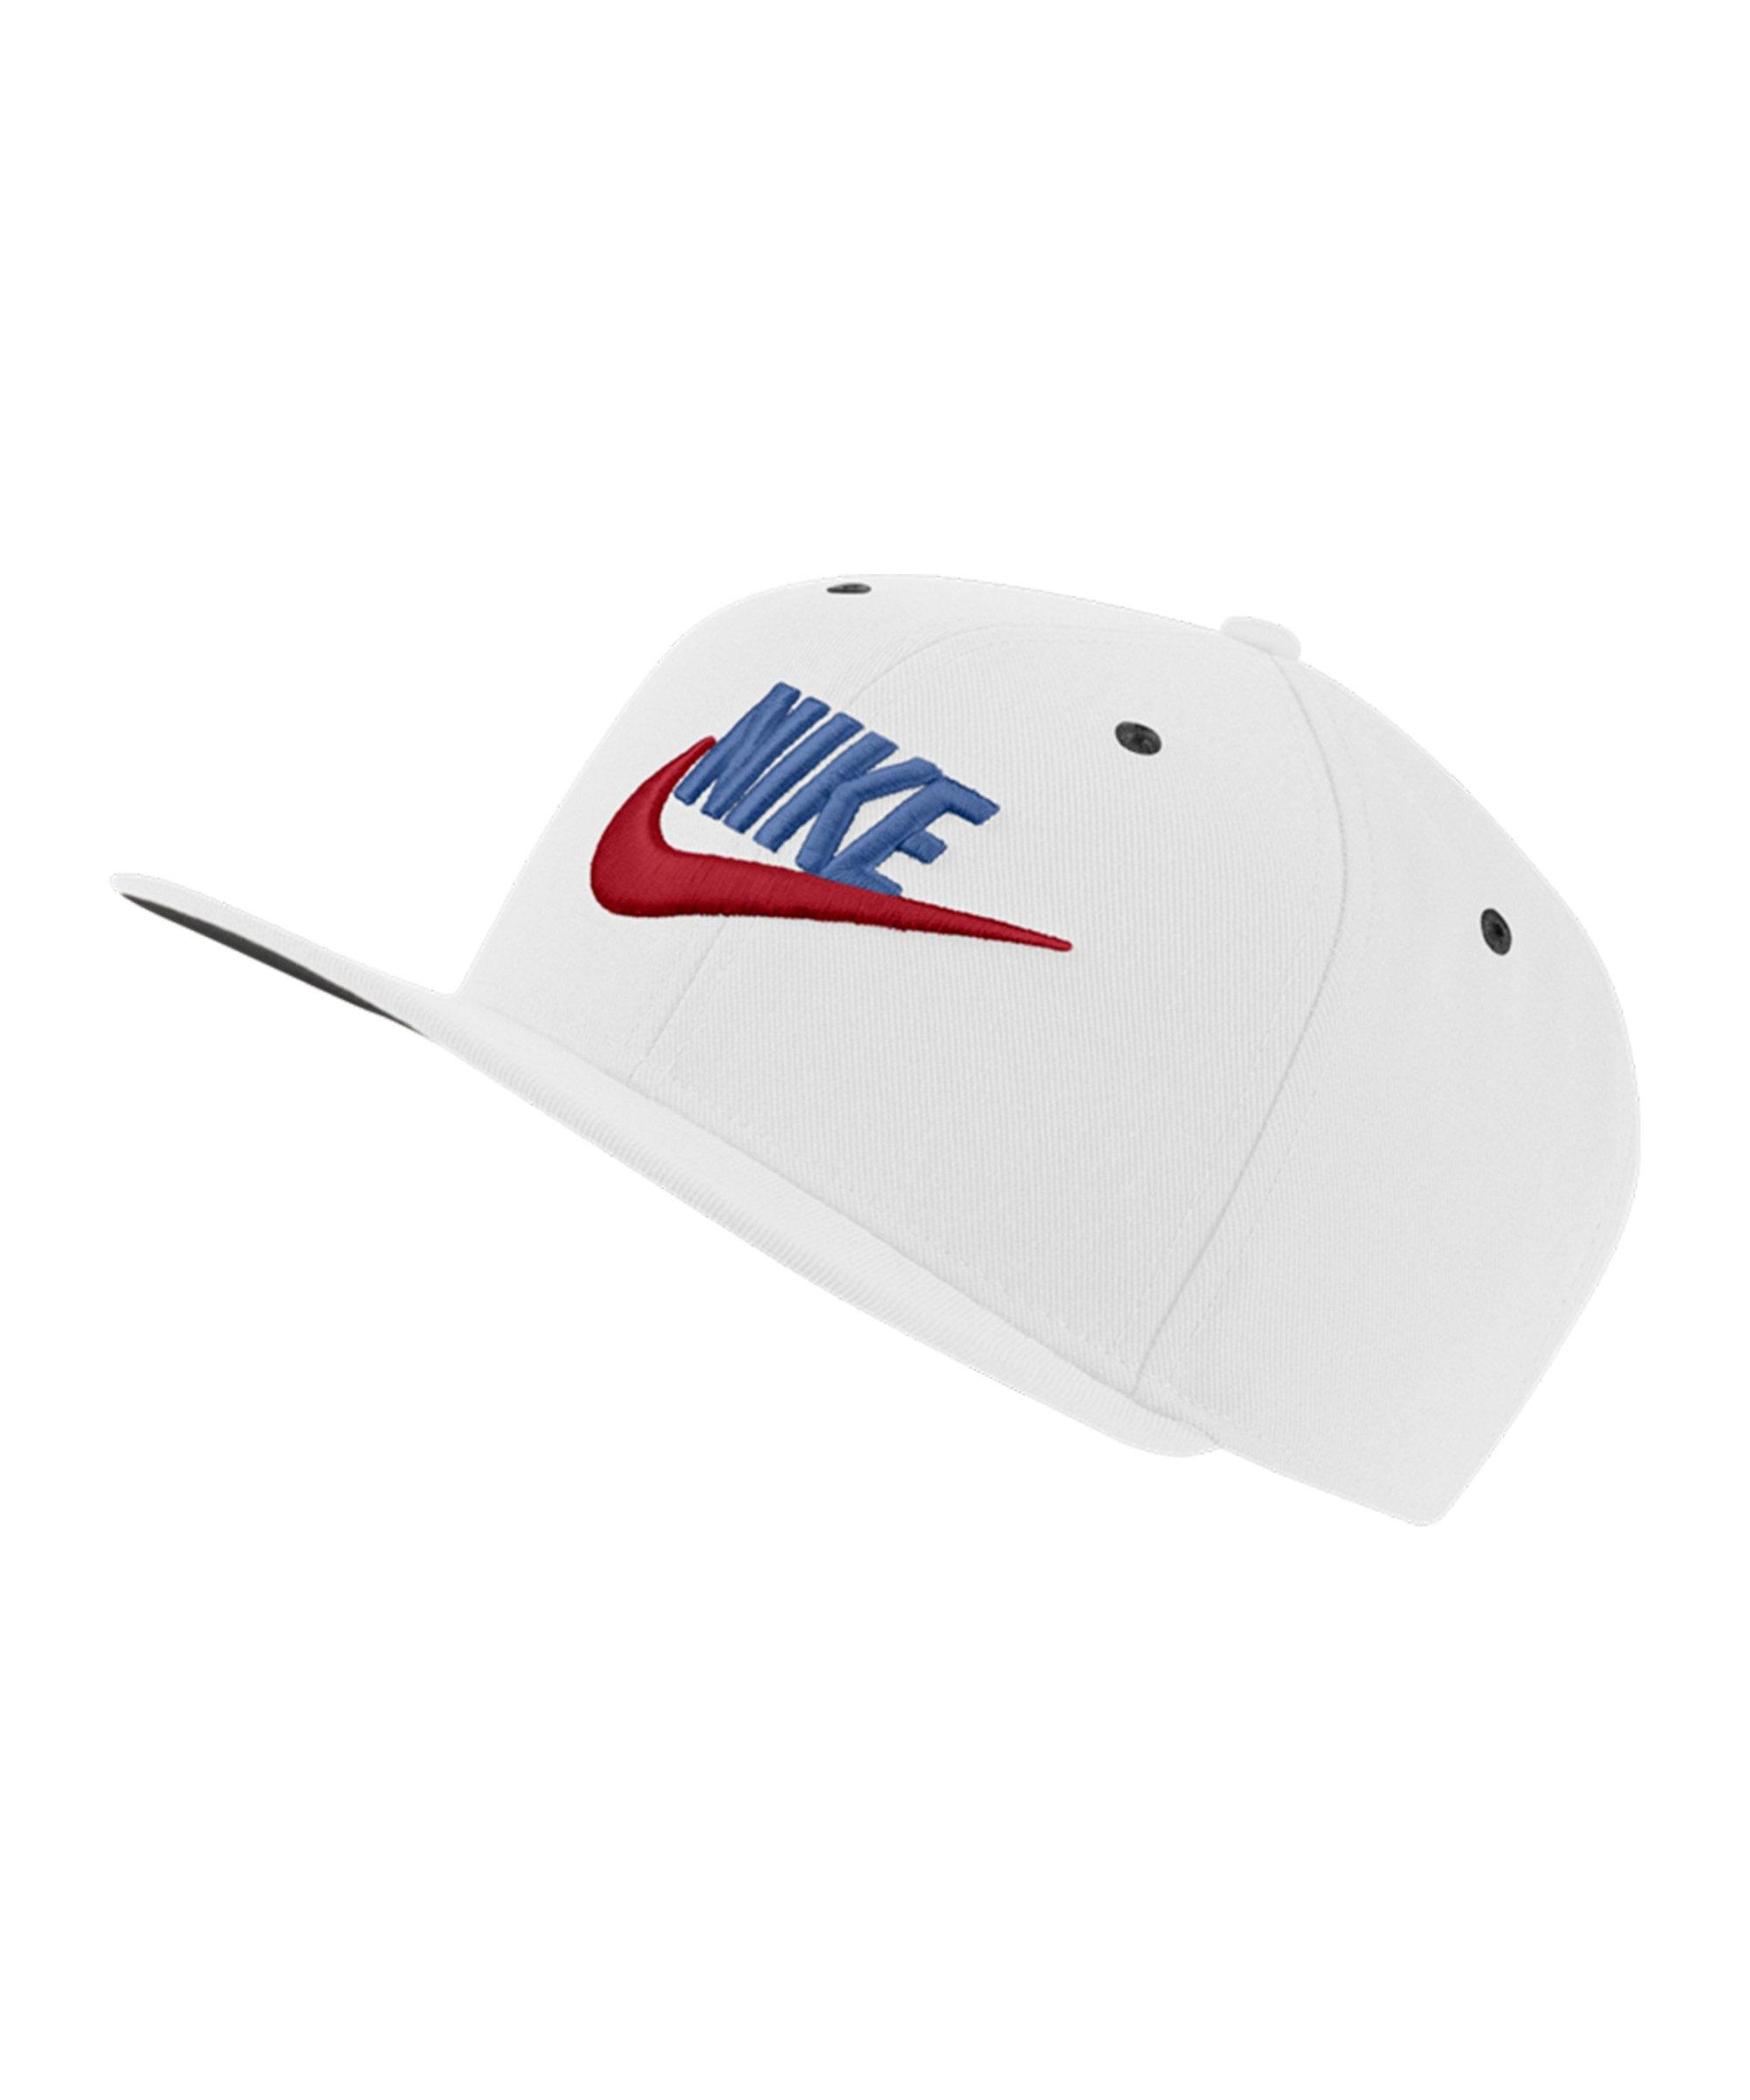 Nike Futura Dri-FIT Cap Weiss Schwarz F104 - weiss